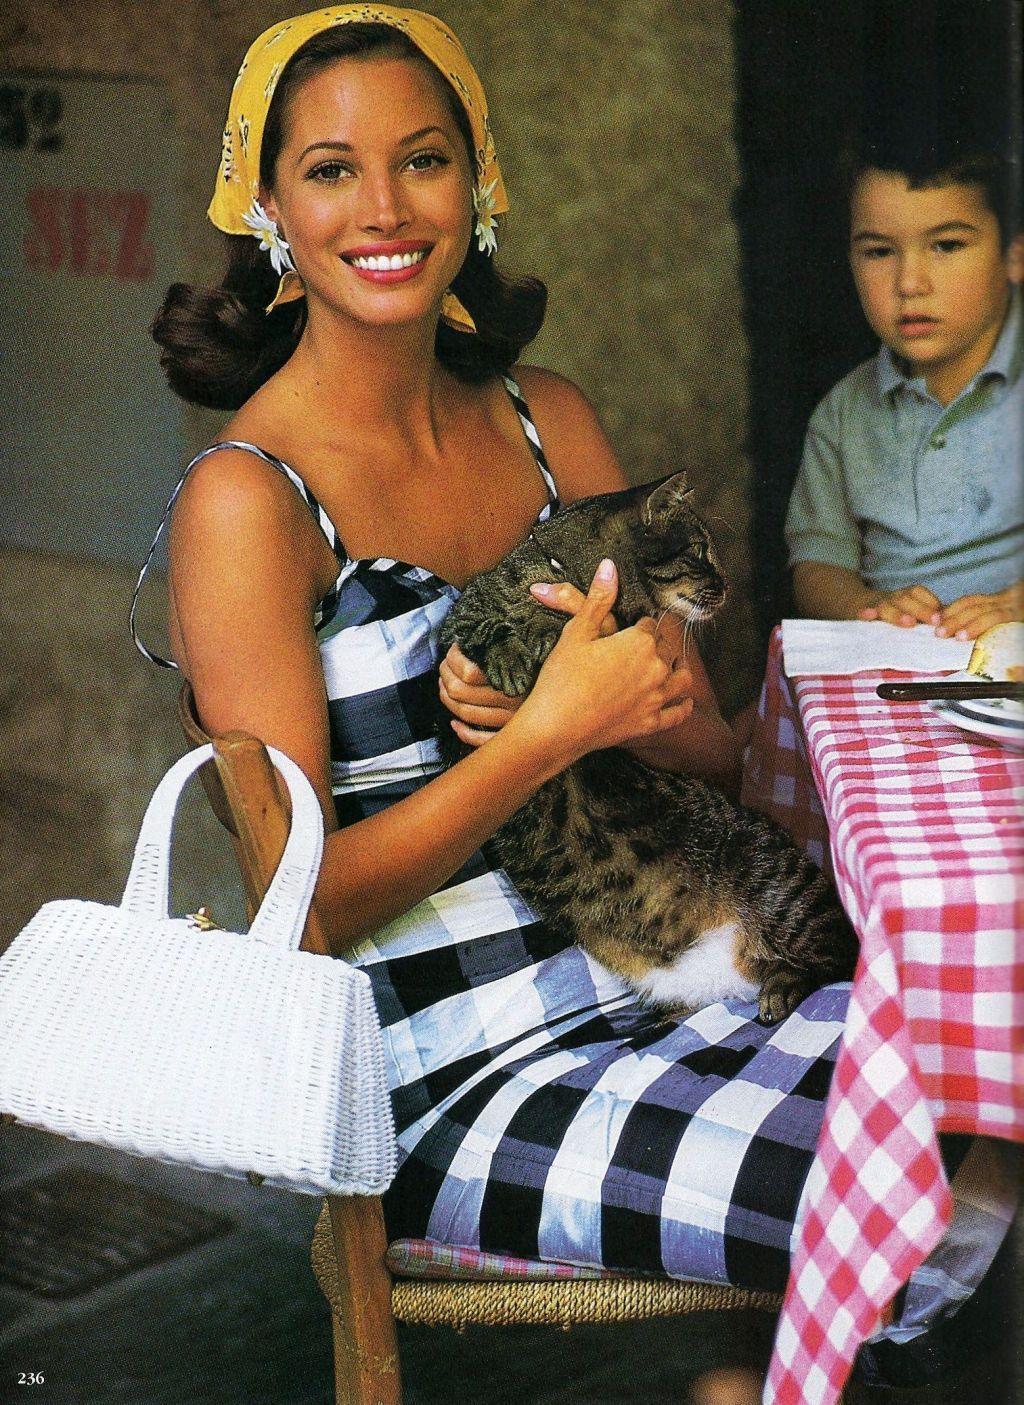 christy-turlington-timeless-summer-style-postcard-from-portofino--=.jpg